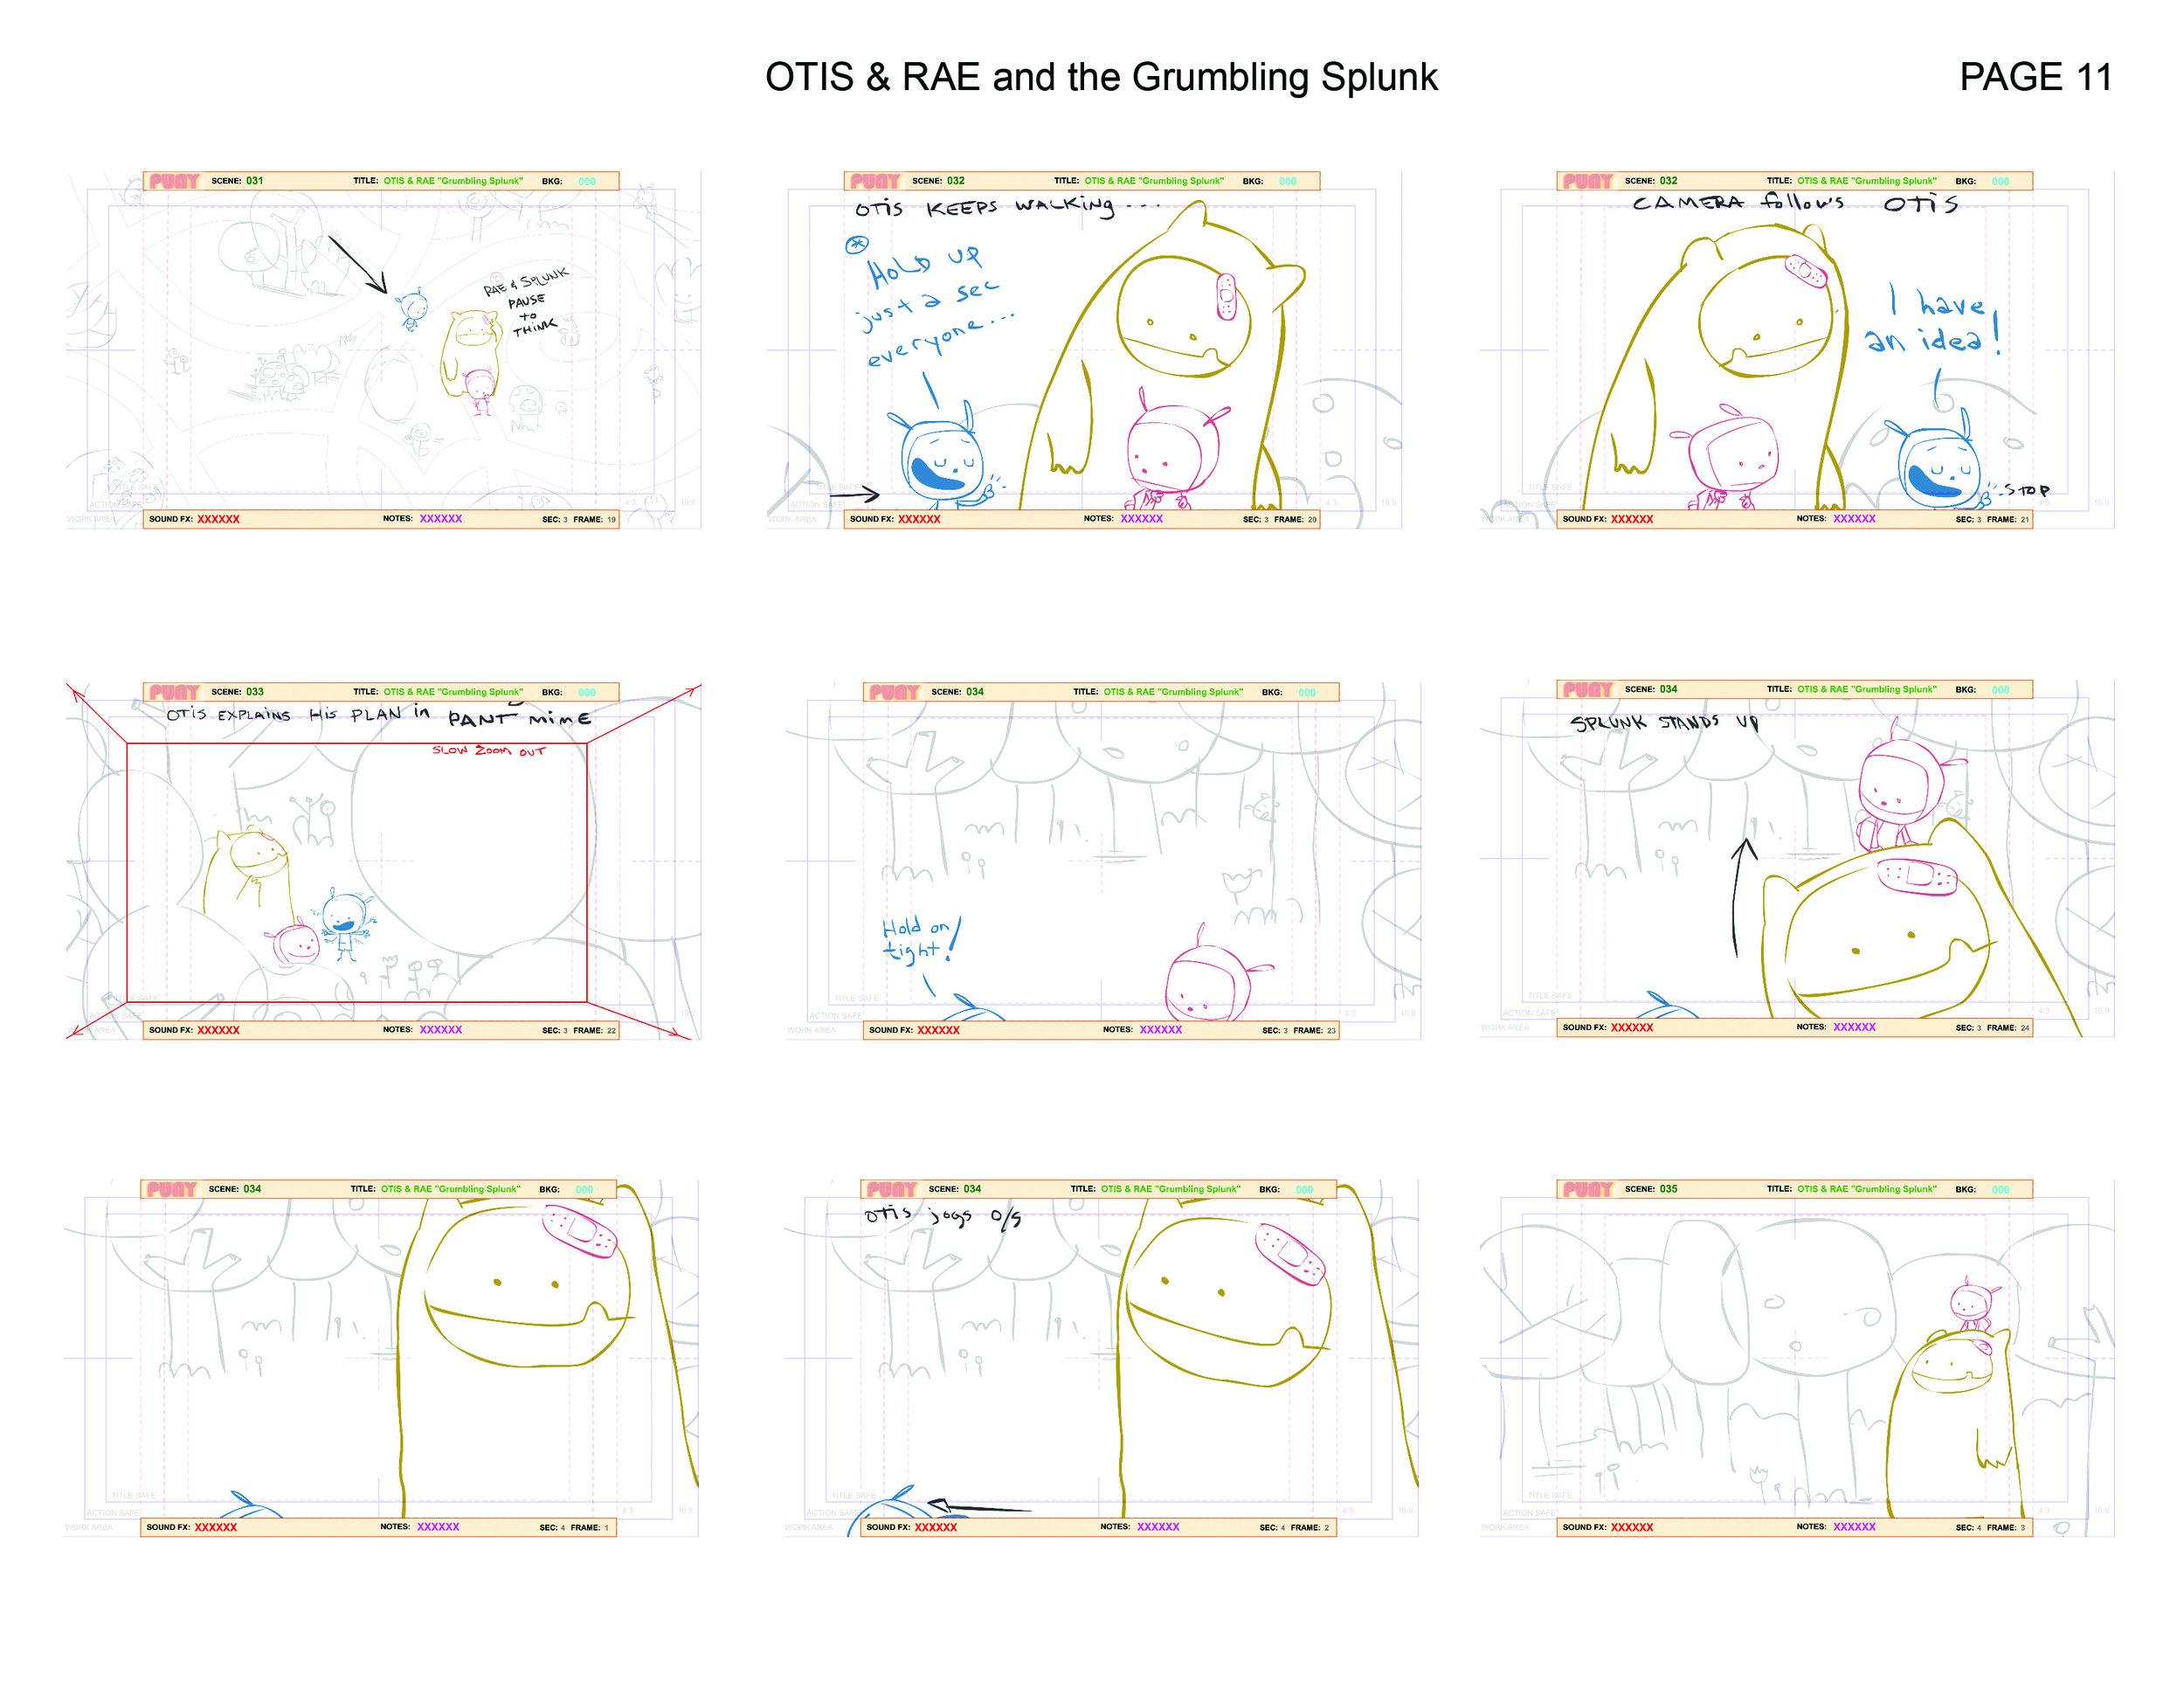 O_R_storyboard_page_11.jpg